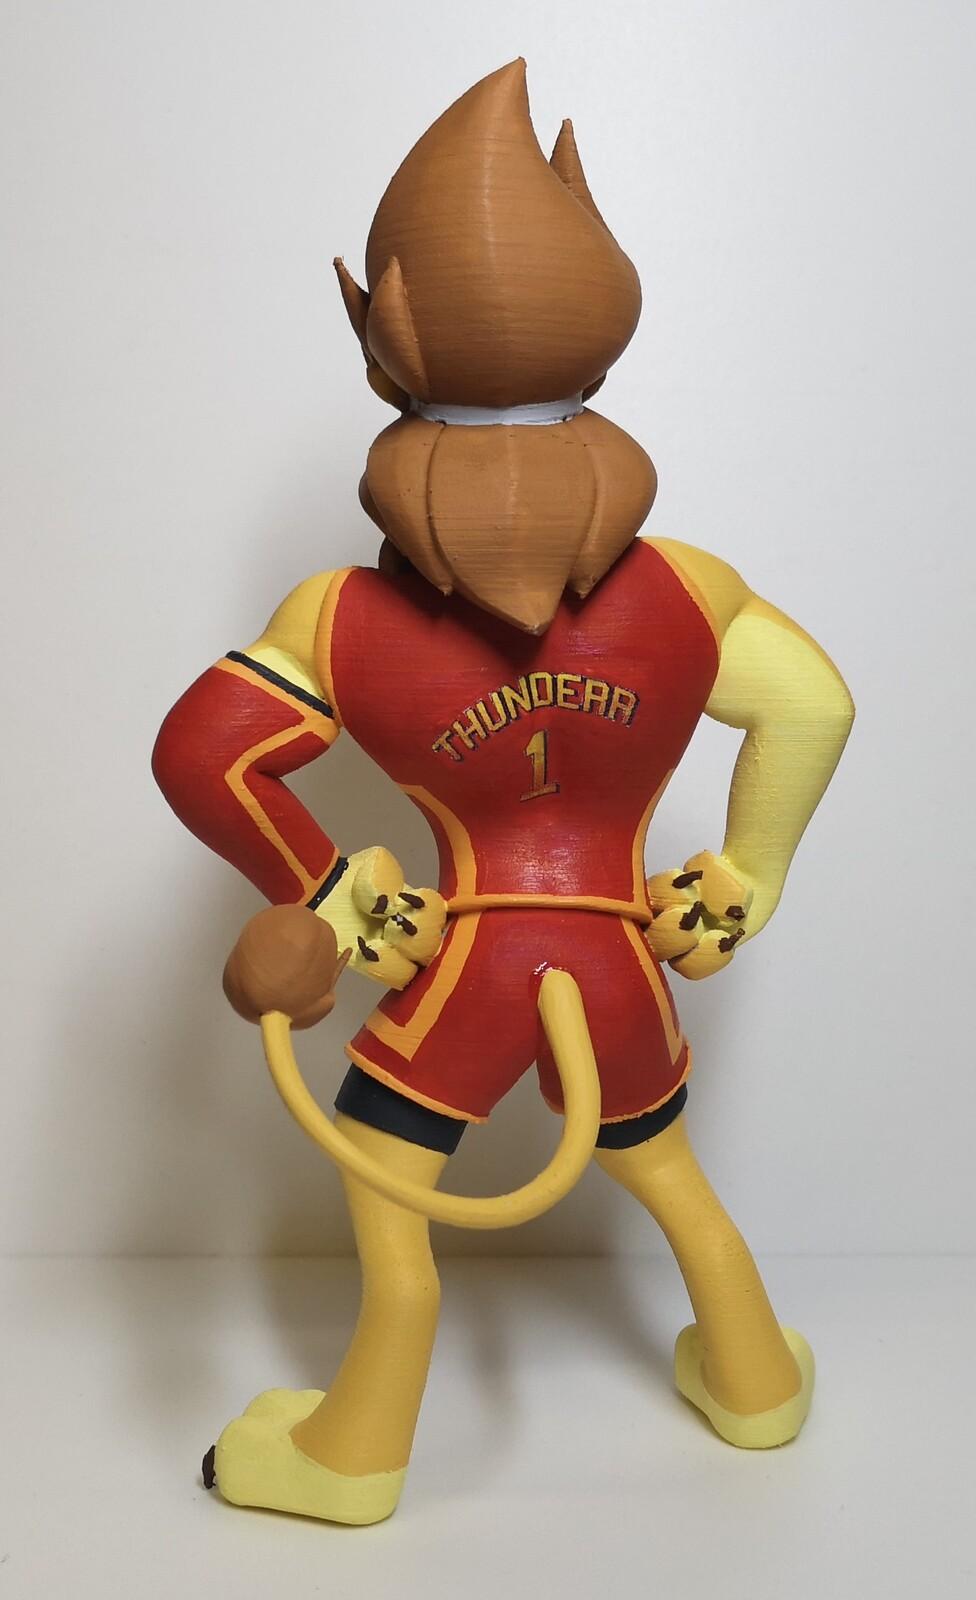 Ace Thunderr Back